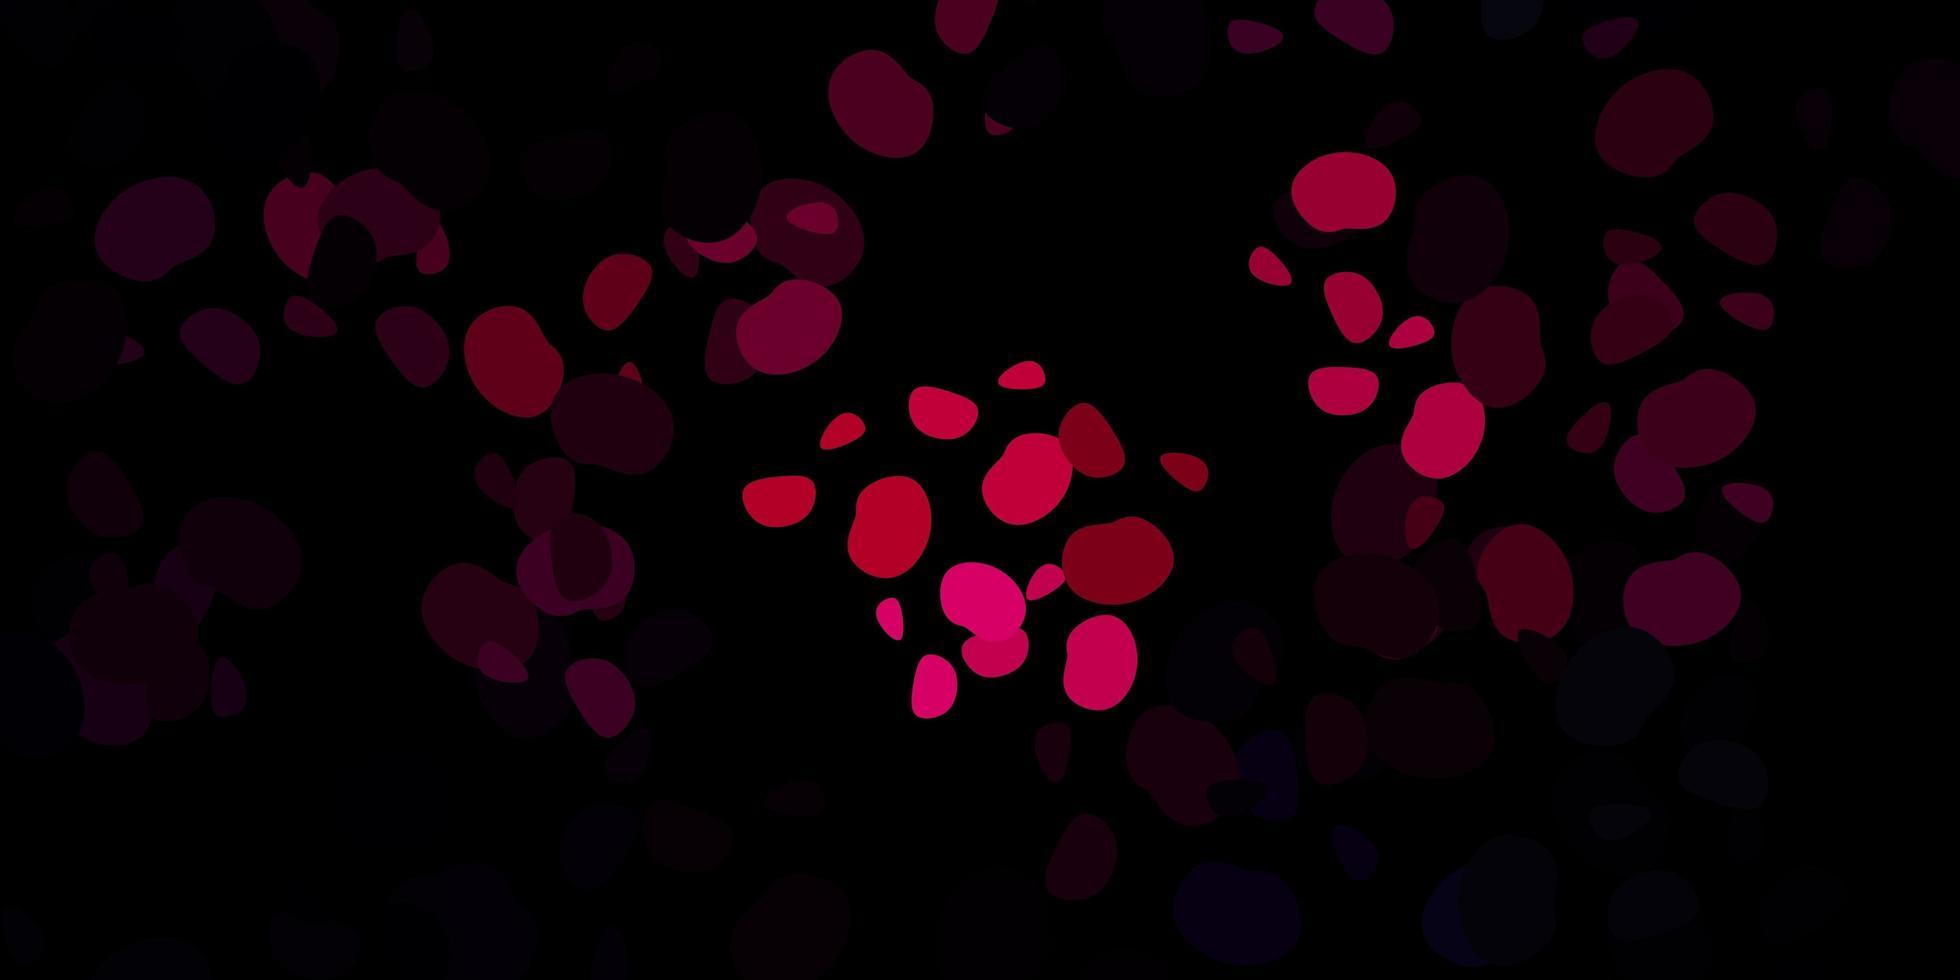 textura vector rosa escuro com formas de memphis.